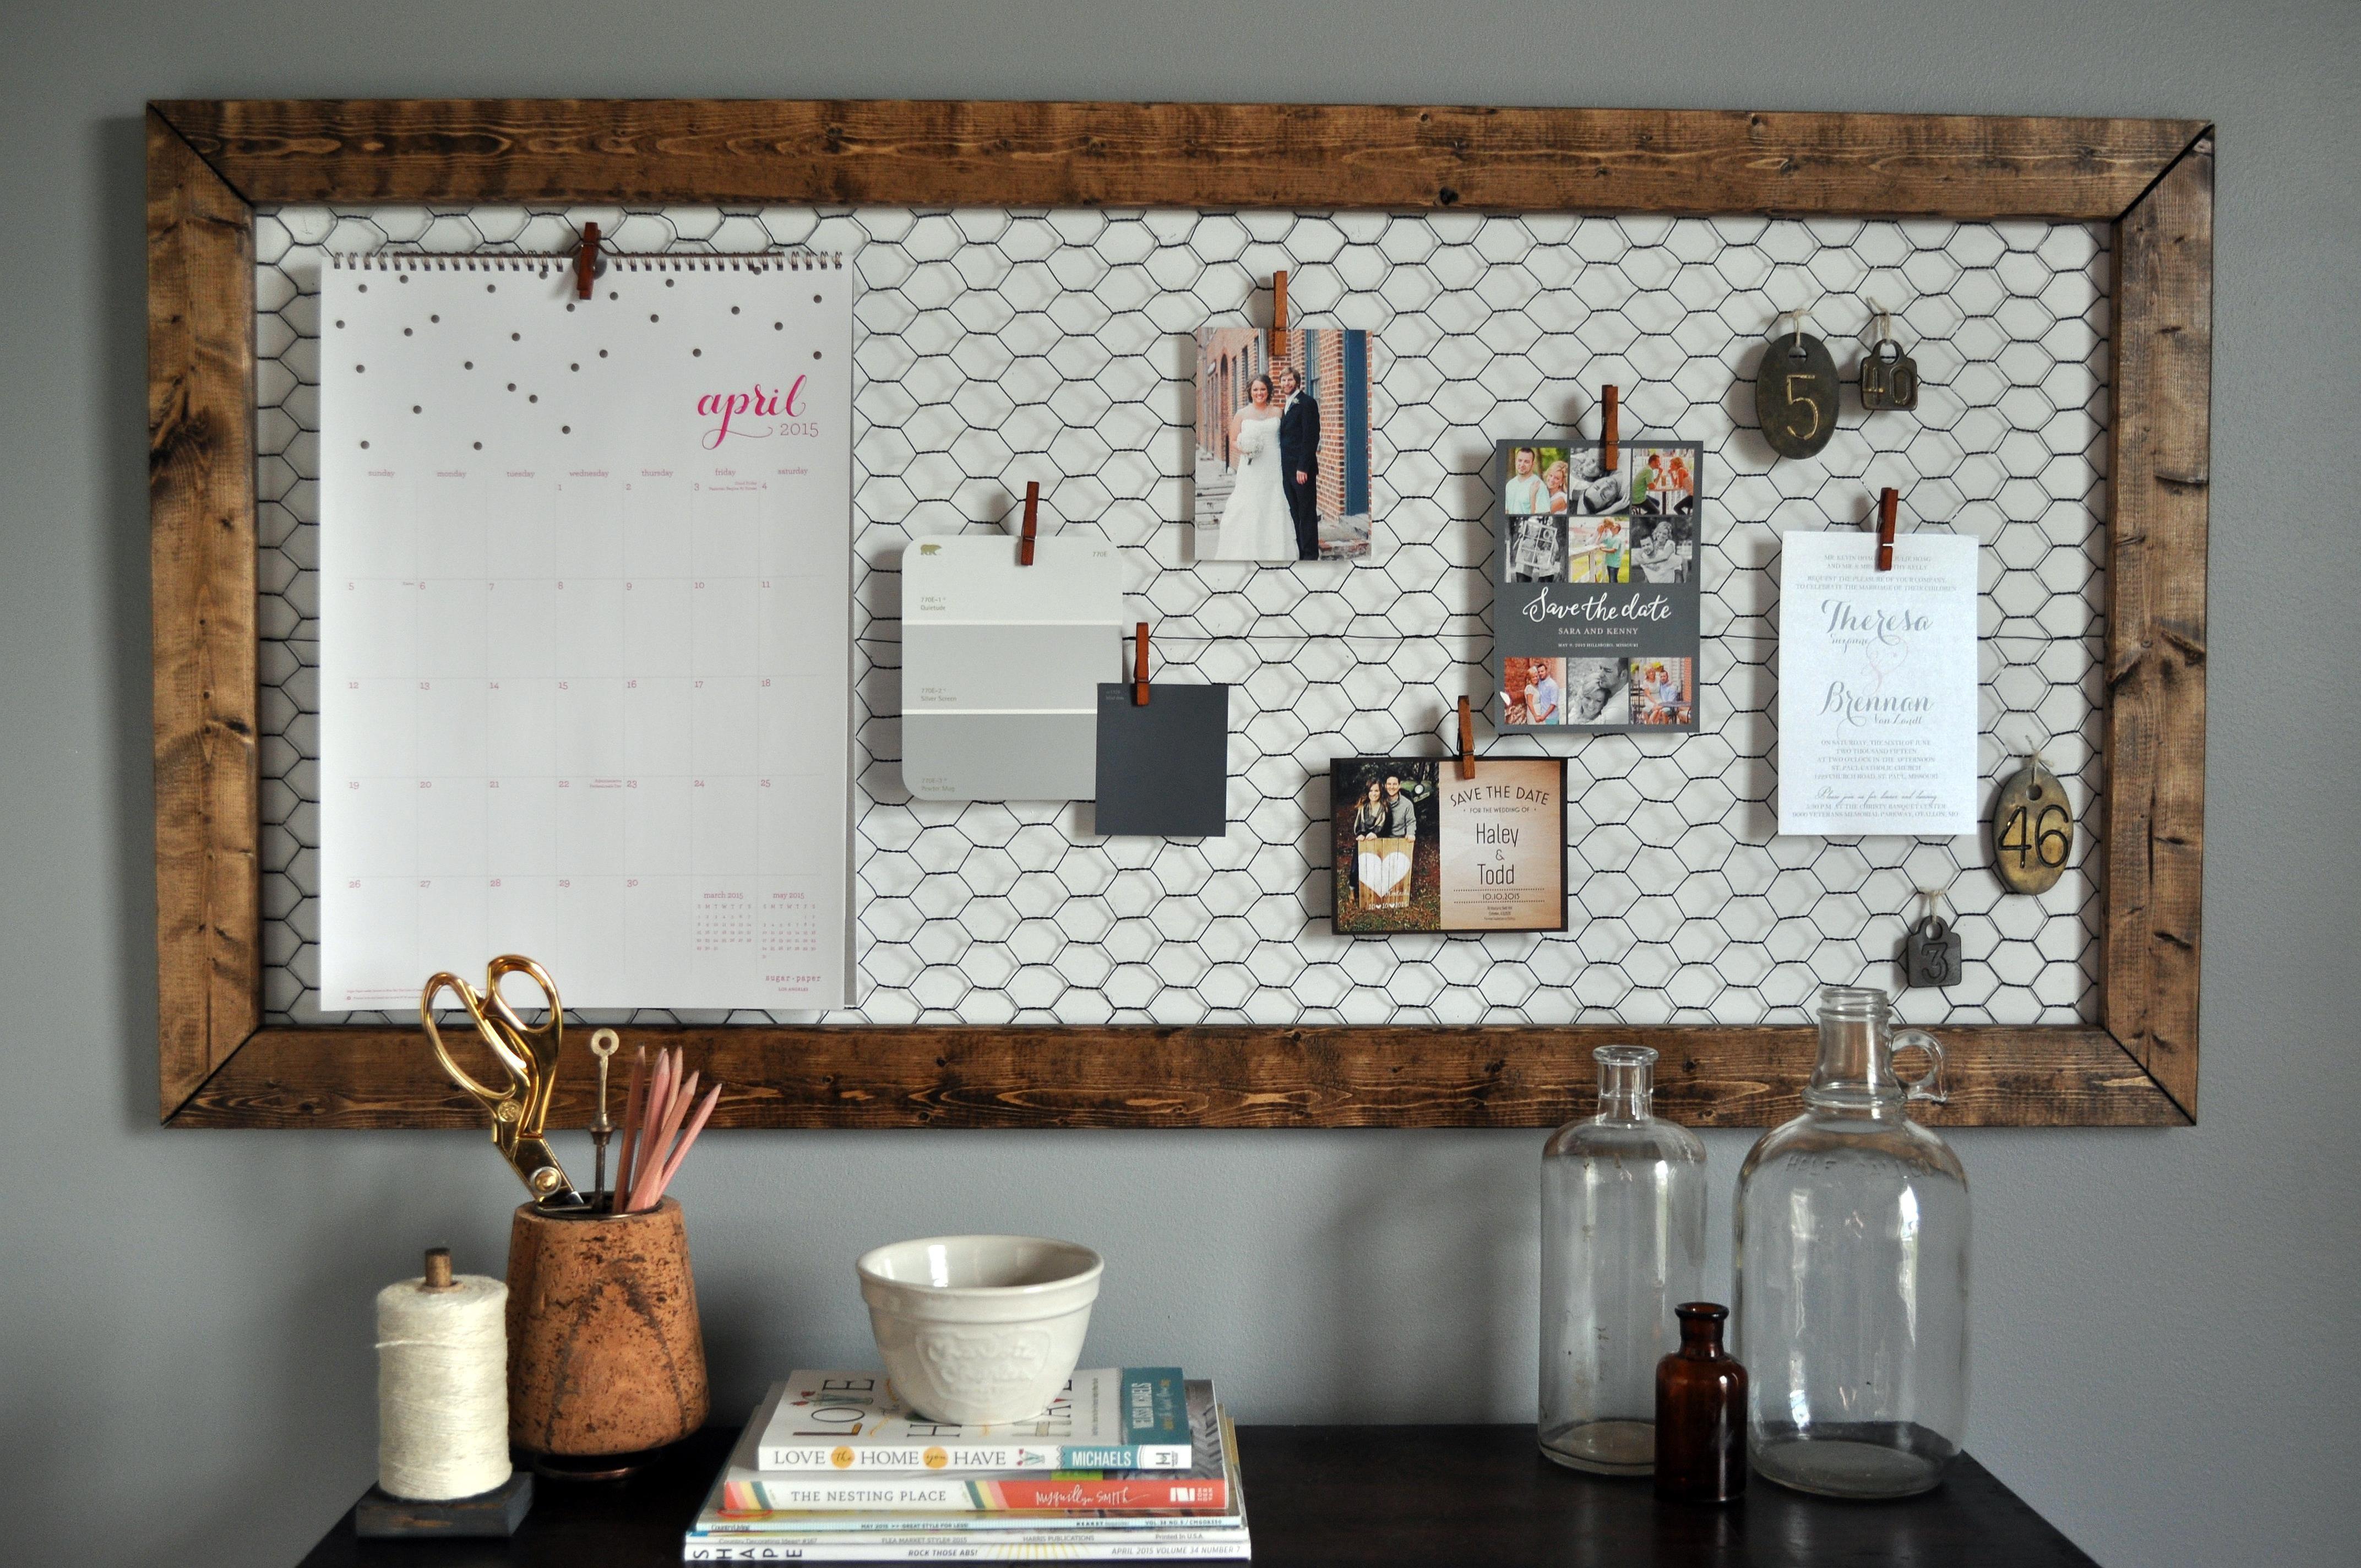 Pallet wedding decor ideas  MemoBoardg  pixels  house  Pinterest  Diy memo